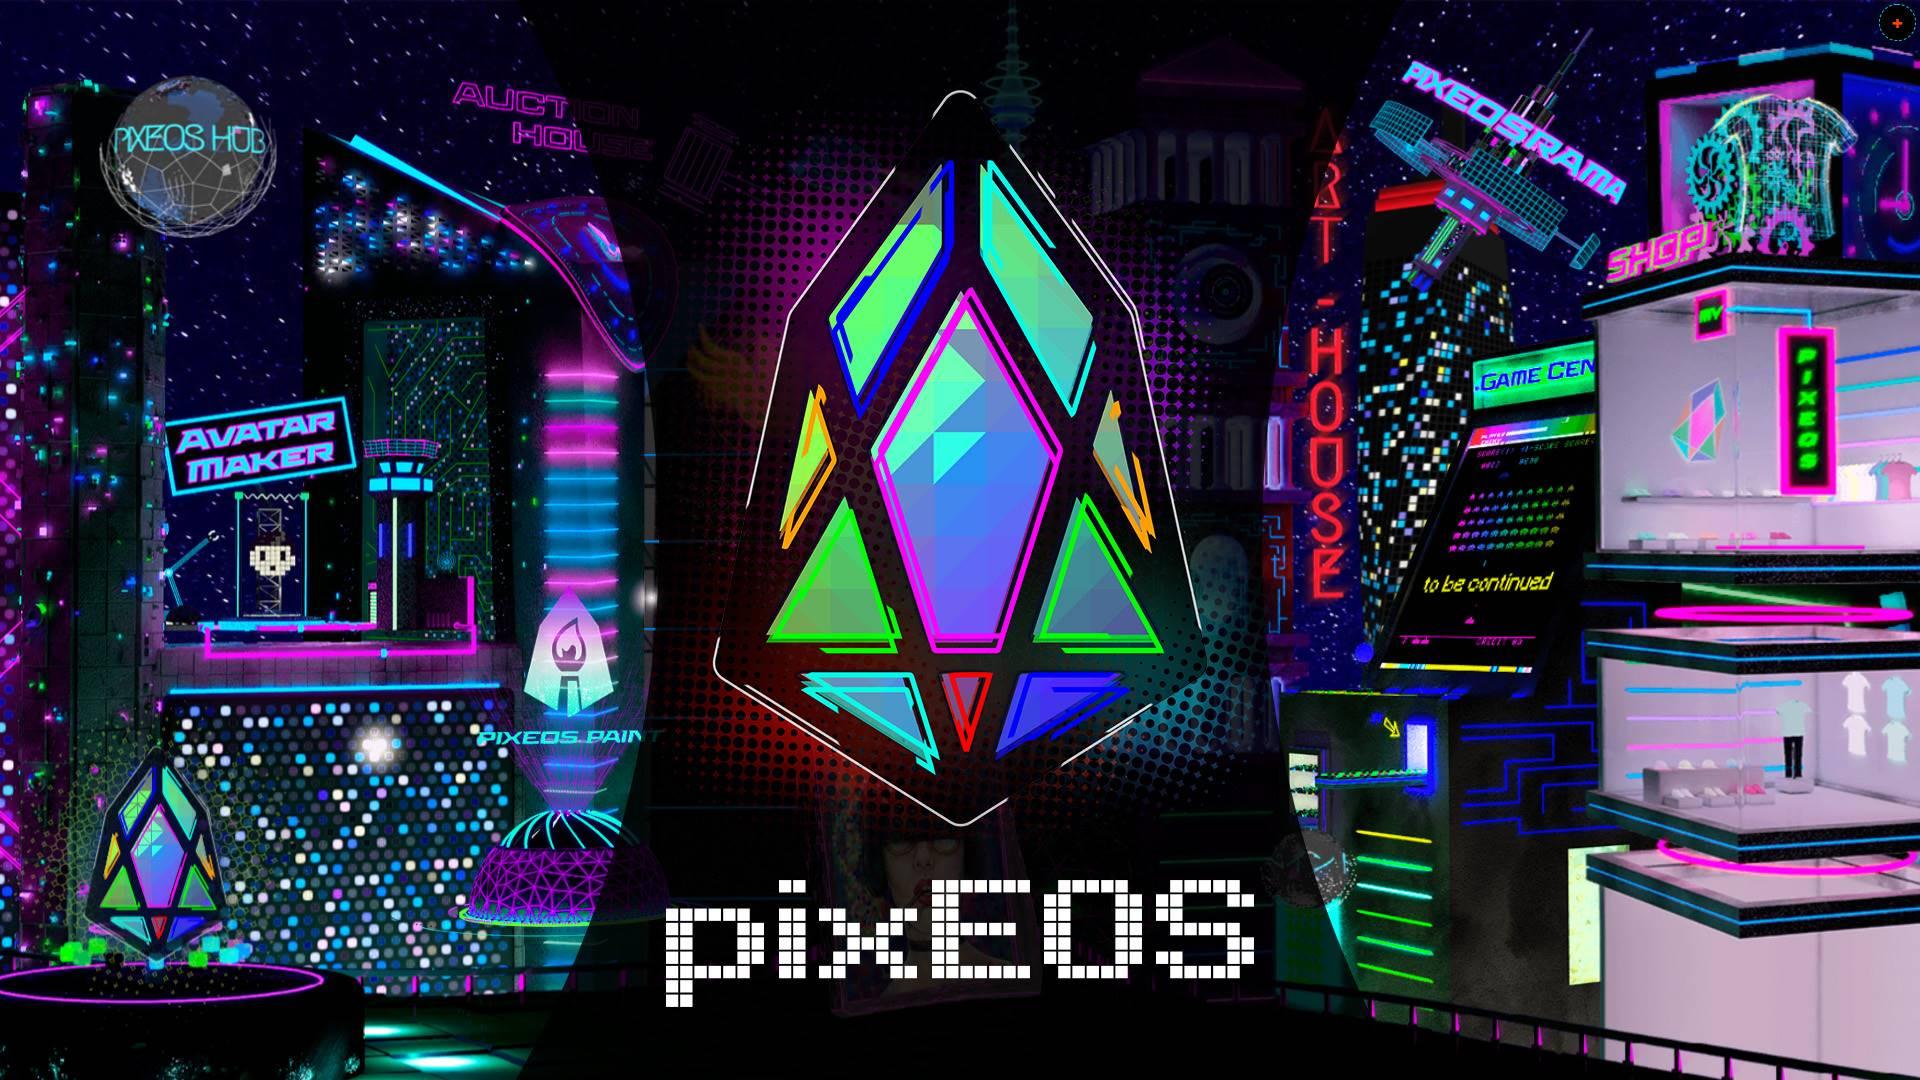 El futurista mundo del Game Center de pixEOS